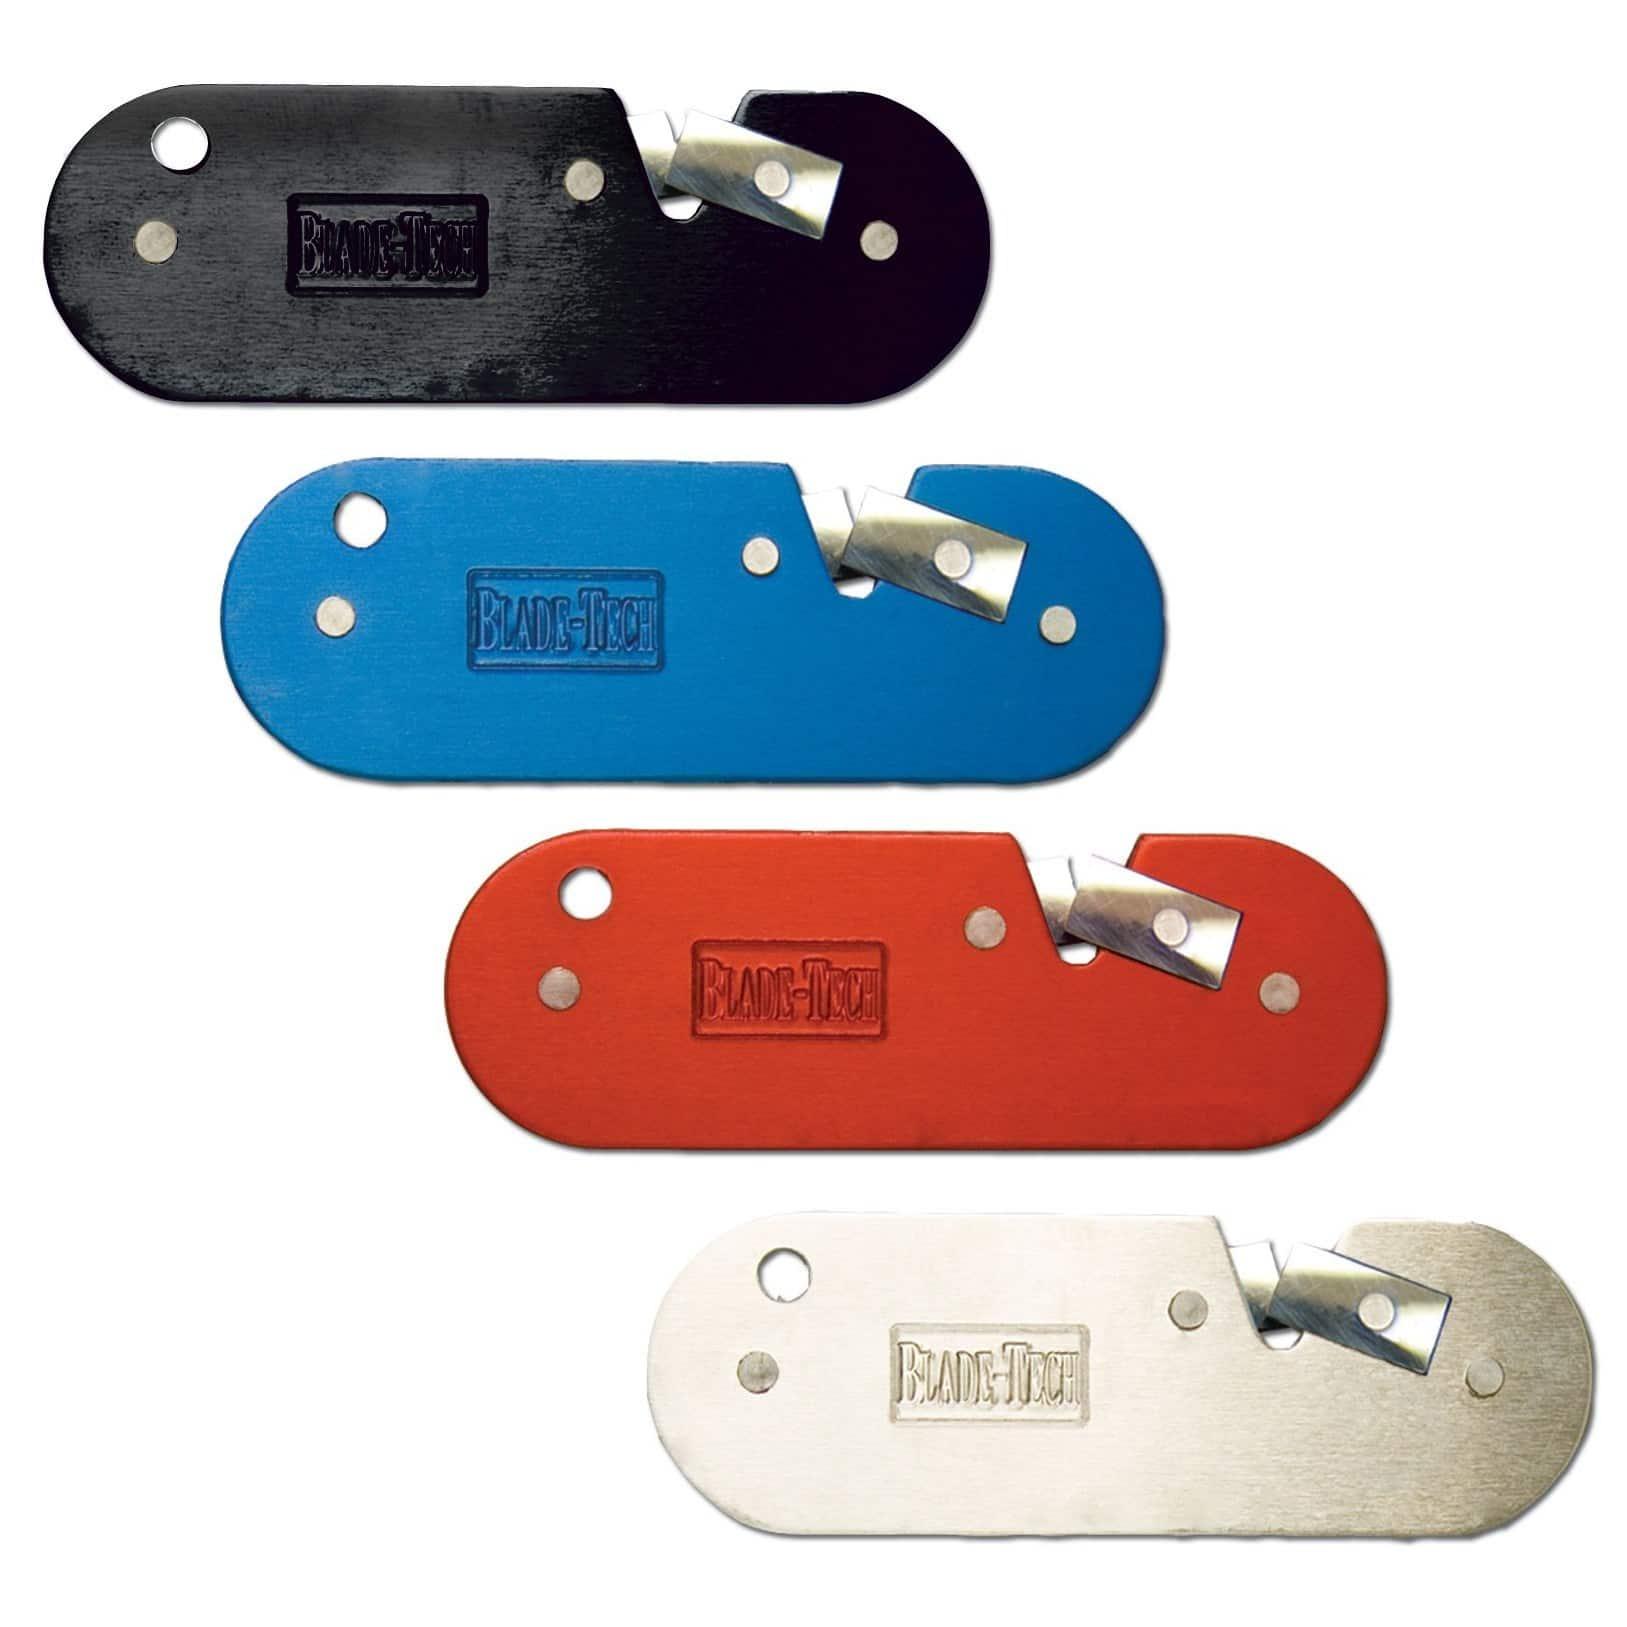 Blade Tech classic knife sharpener